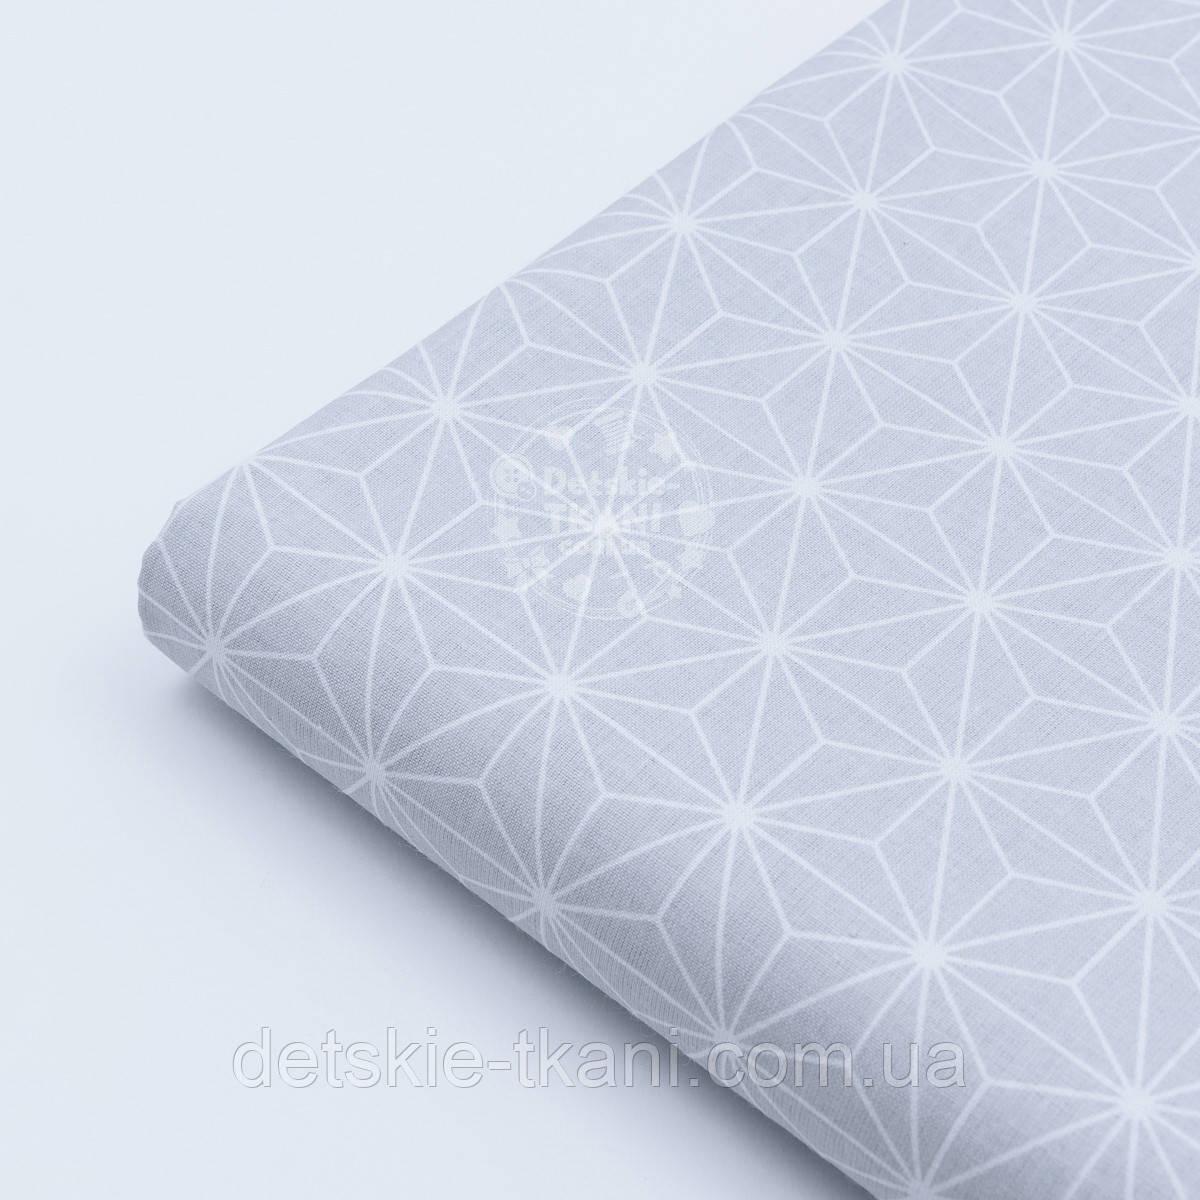 "Лоскут ткани ""Геометрический цветок"" белый на сером, №1651а, размер 21*160 см"